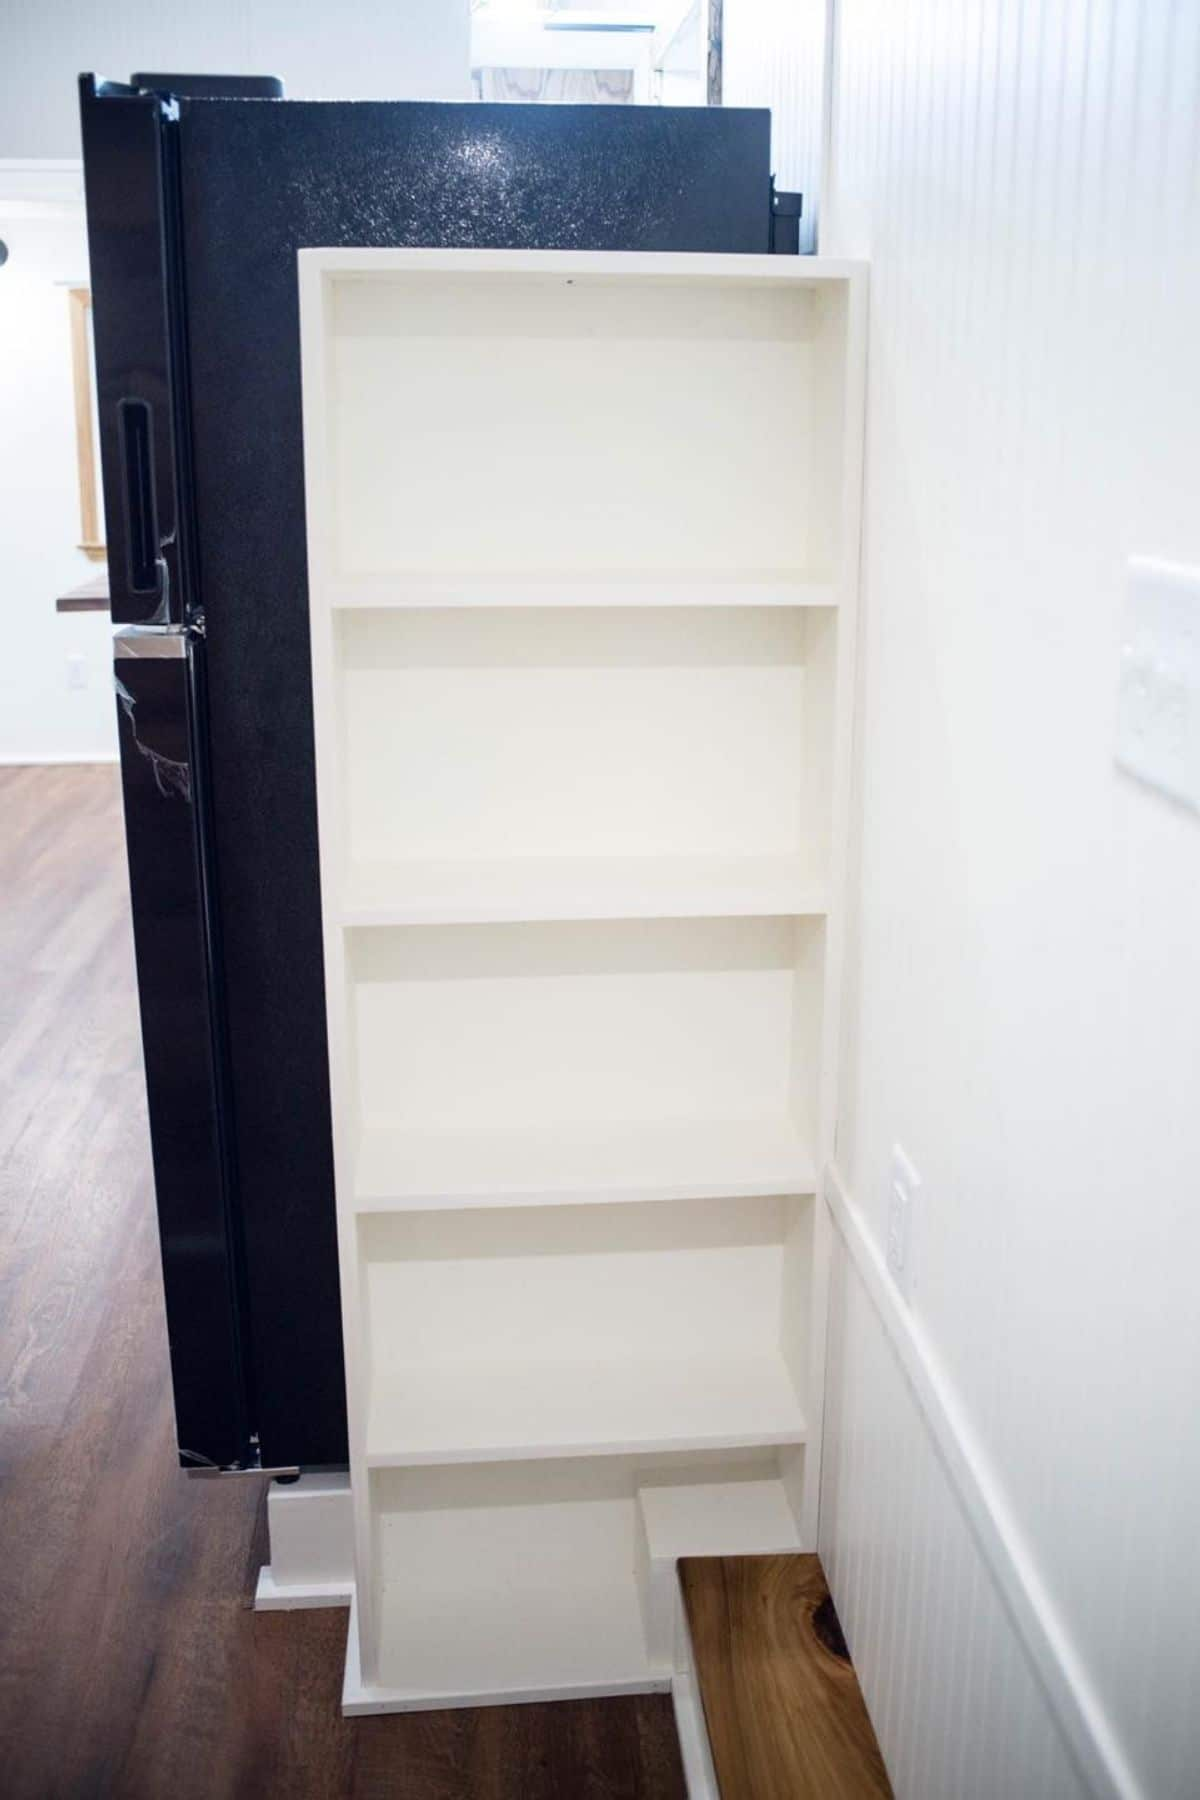 white shelf beside black refrigerator